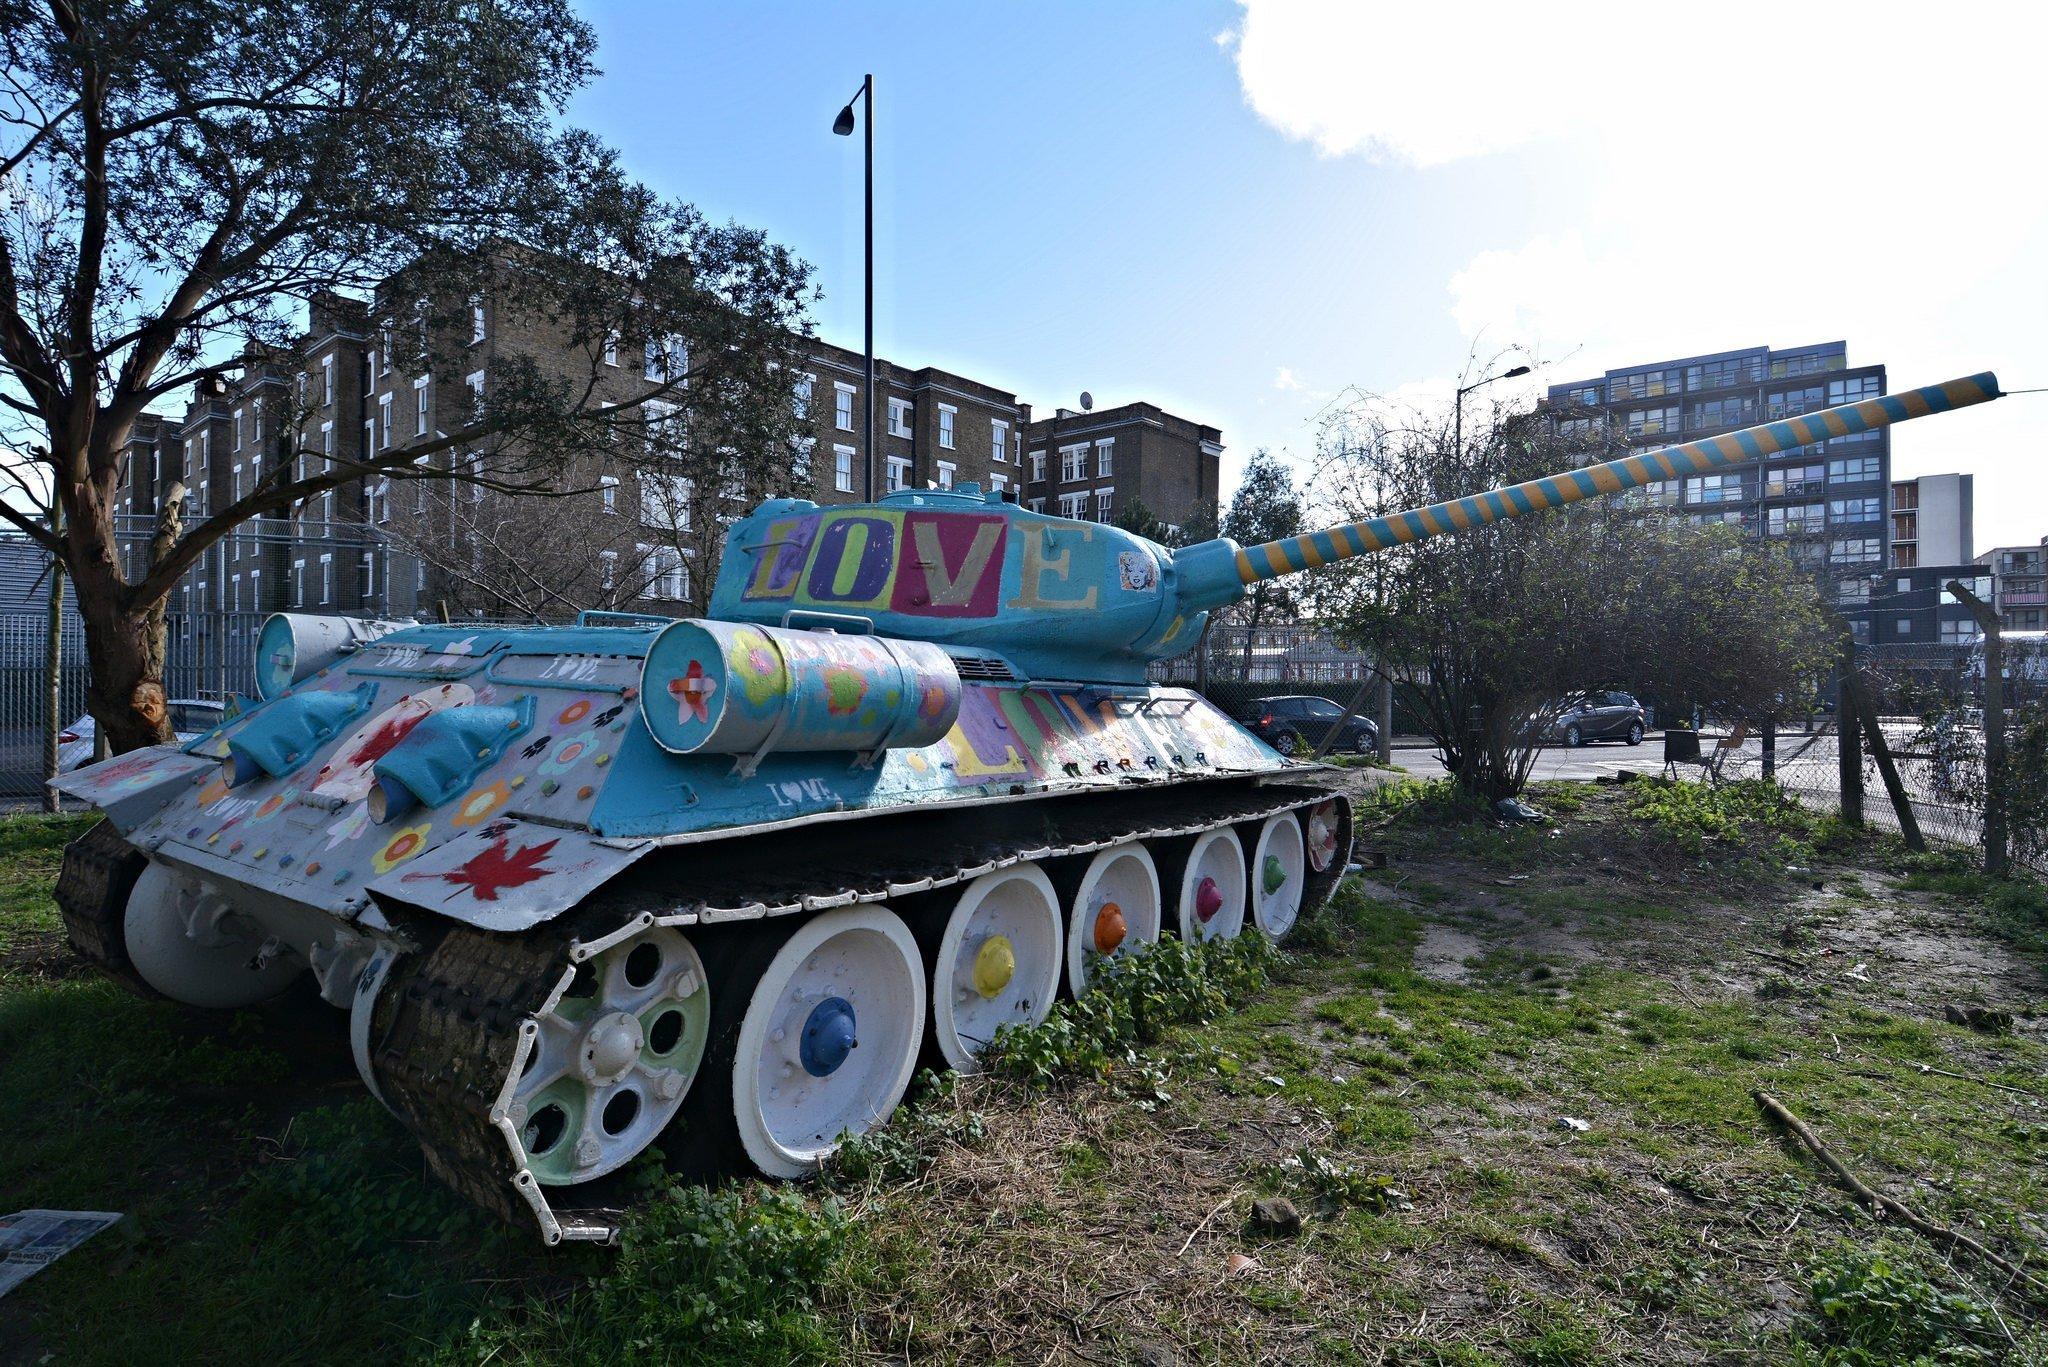 t34 soviet tank mandela way london england stompie stompy